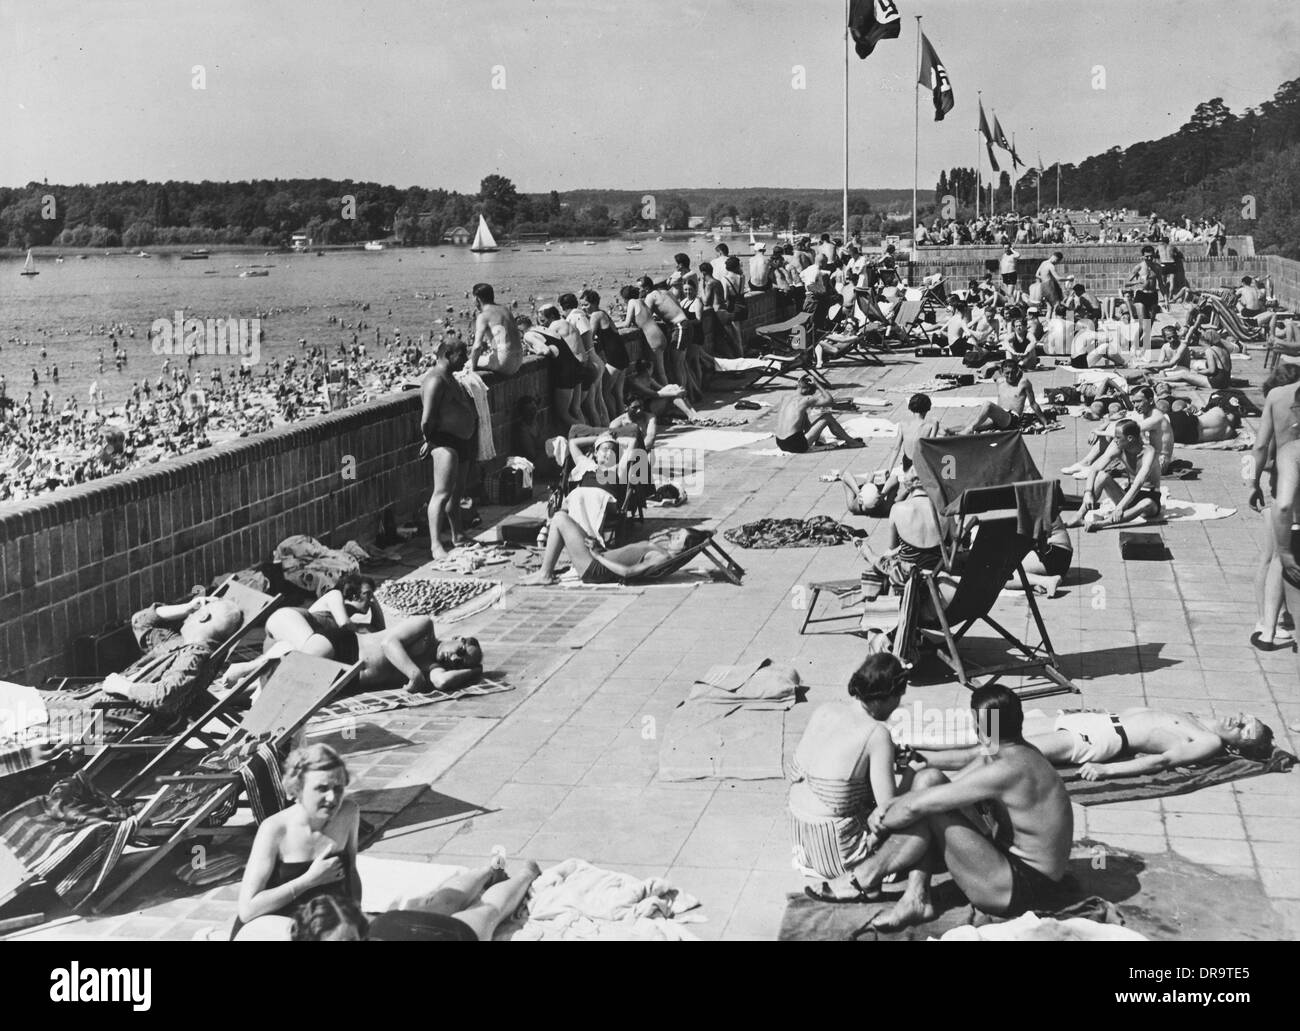 Nazi holiday resort stock photo royalty free image for Nazi holiday resort